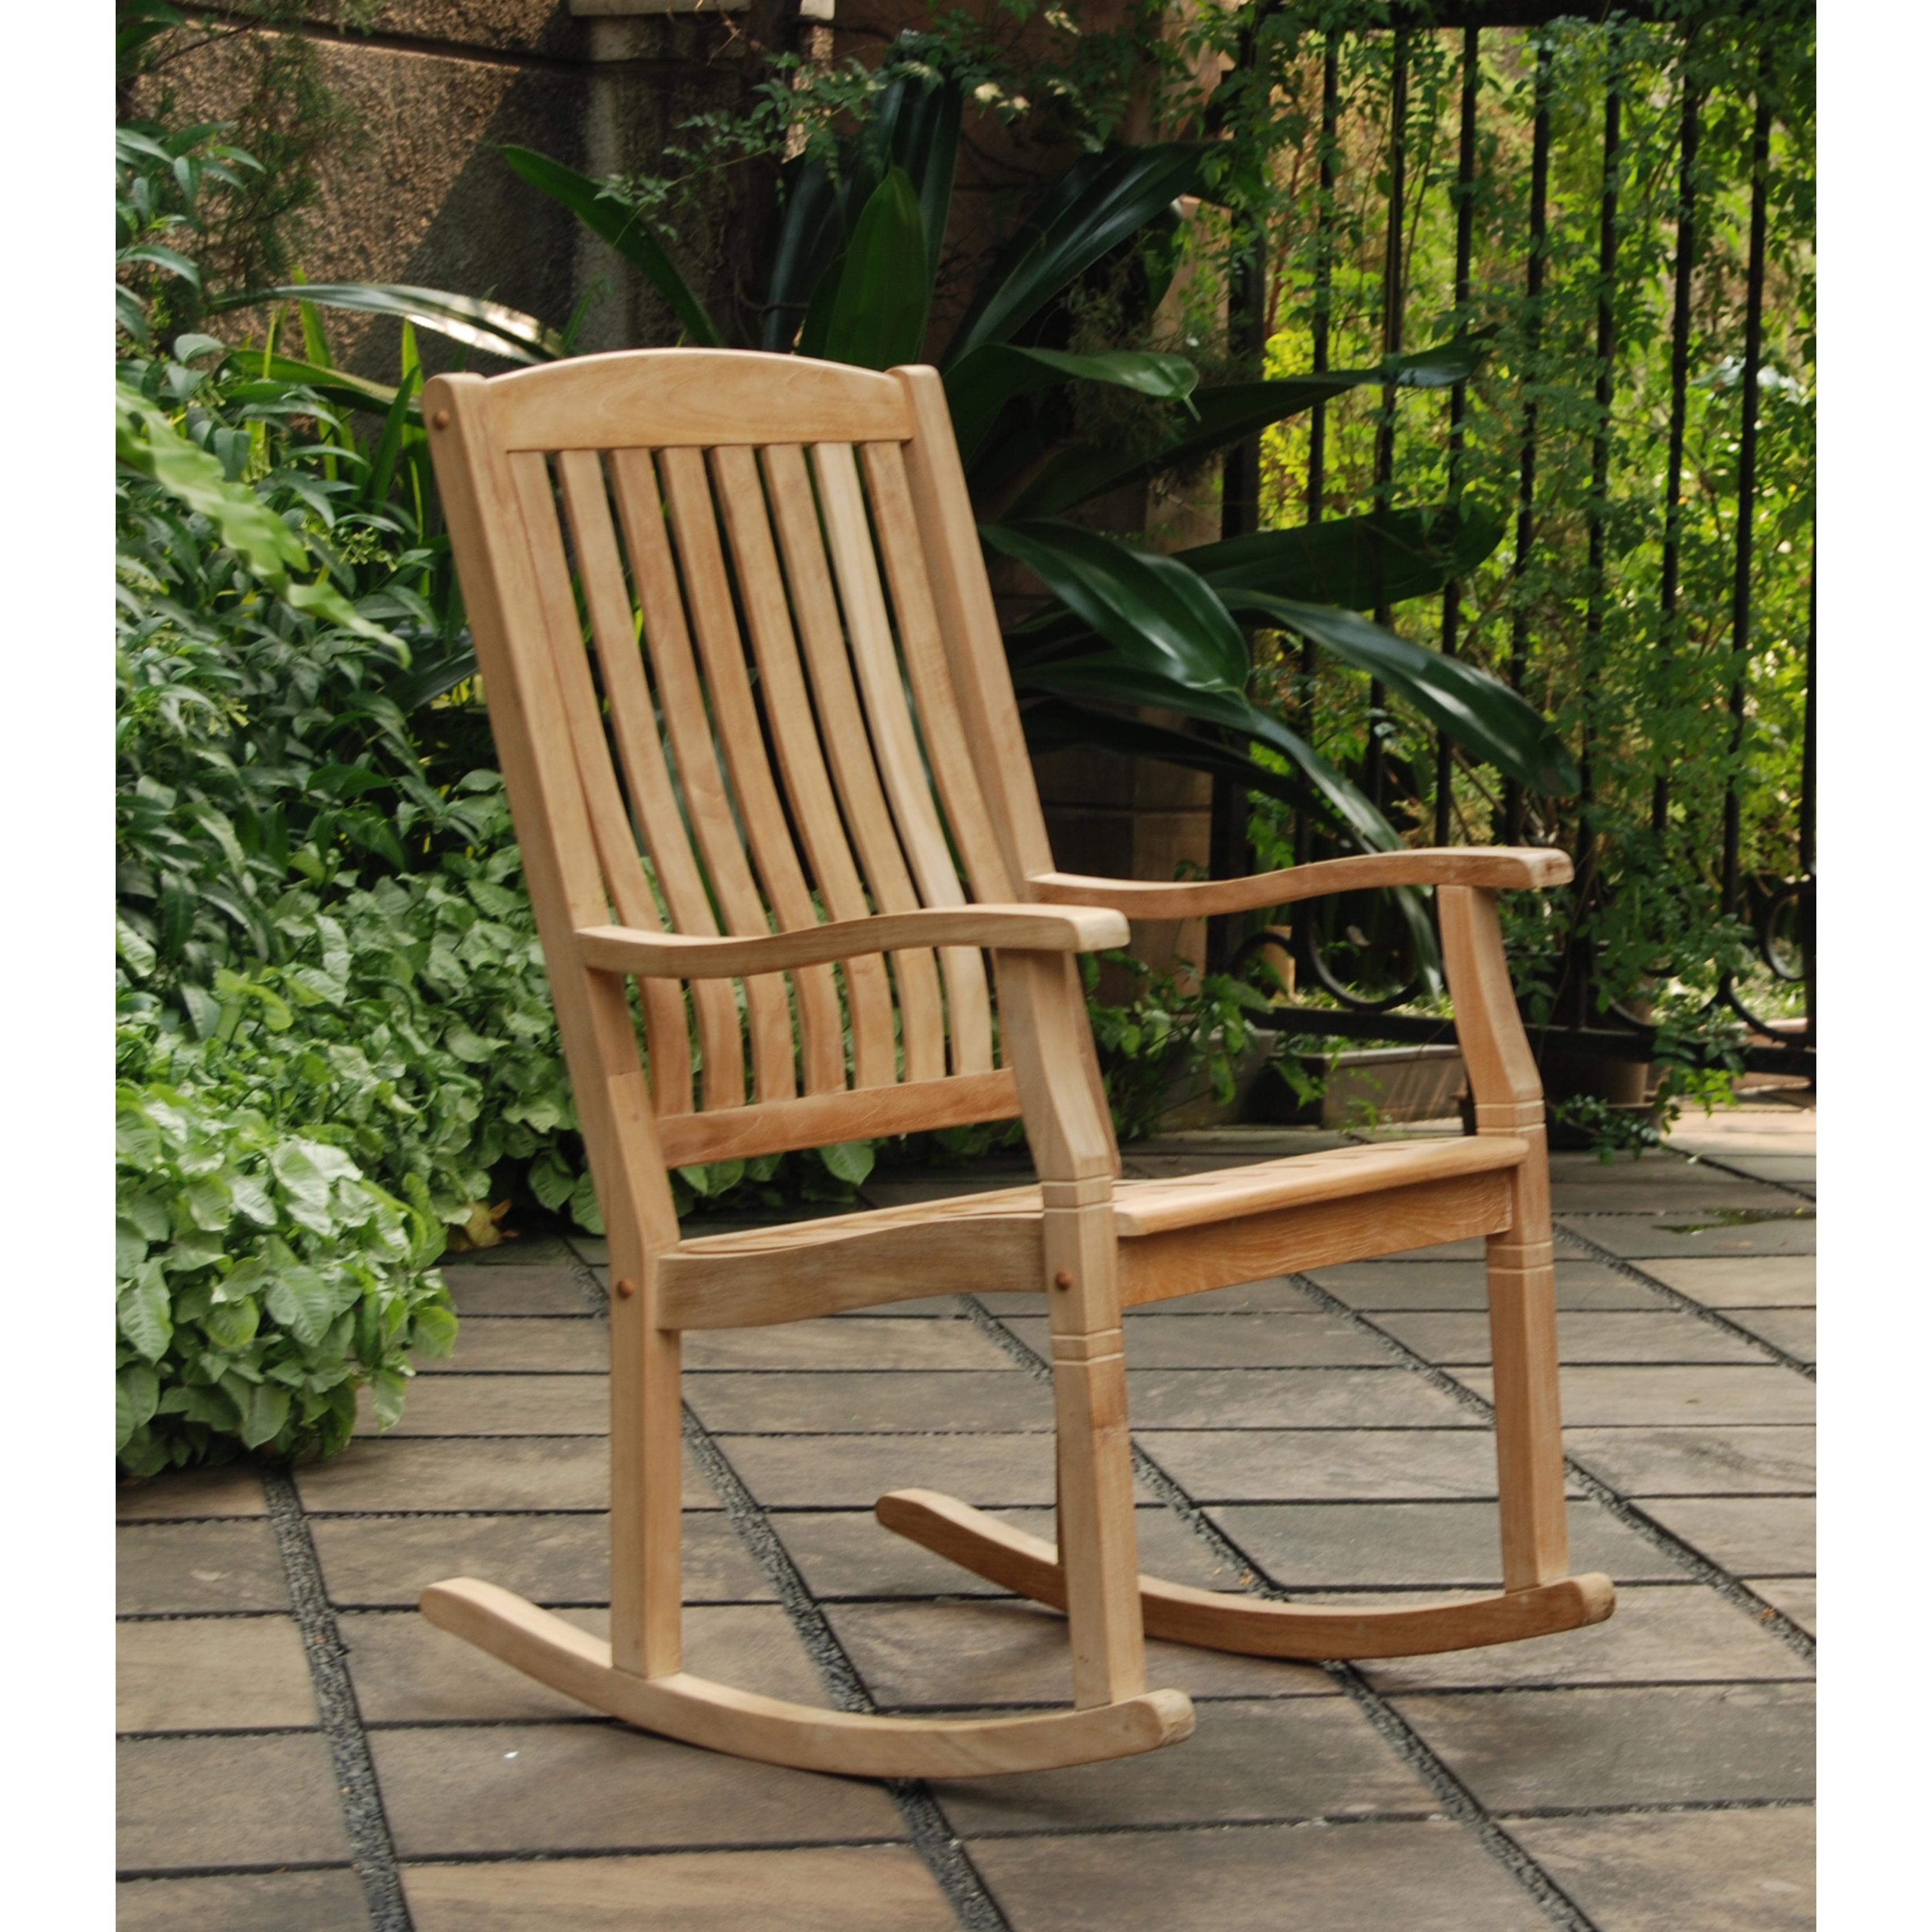 Shop Cambridge Casual Sherwood Natural Teak Porch Rocking Chair Regarding Teak Patio Rocking Chairs (View 14 of 15)